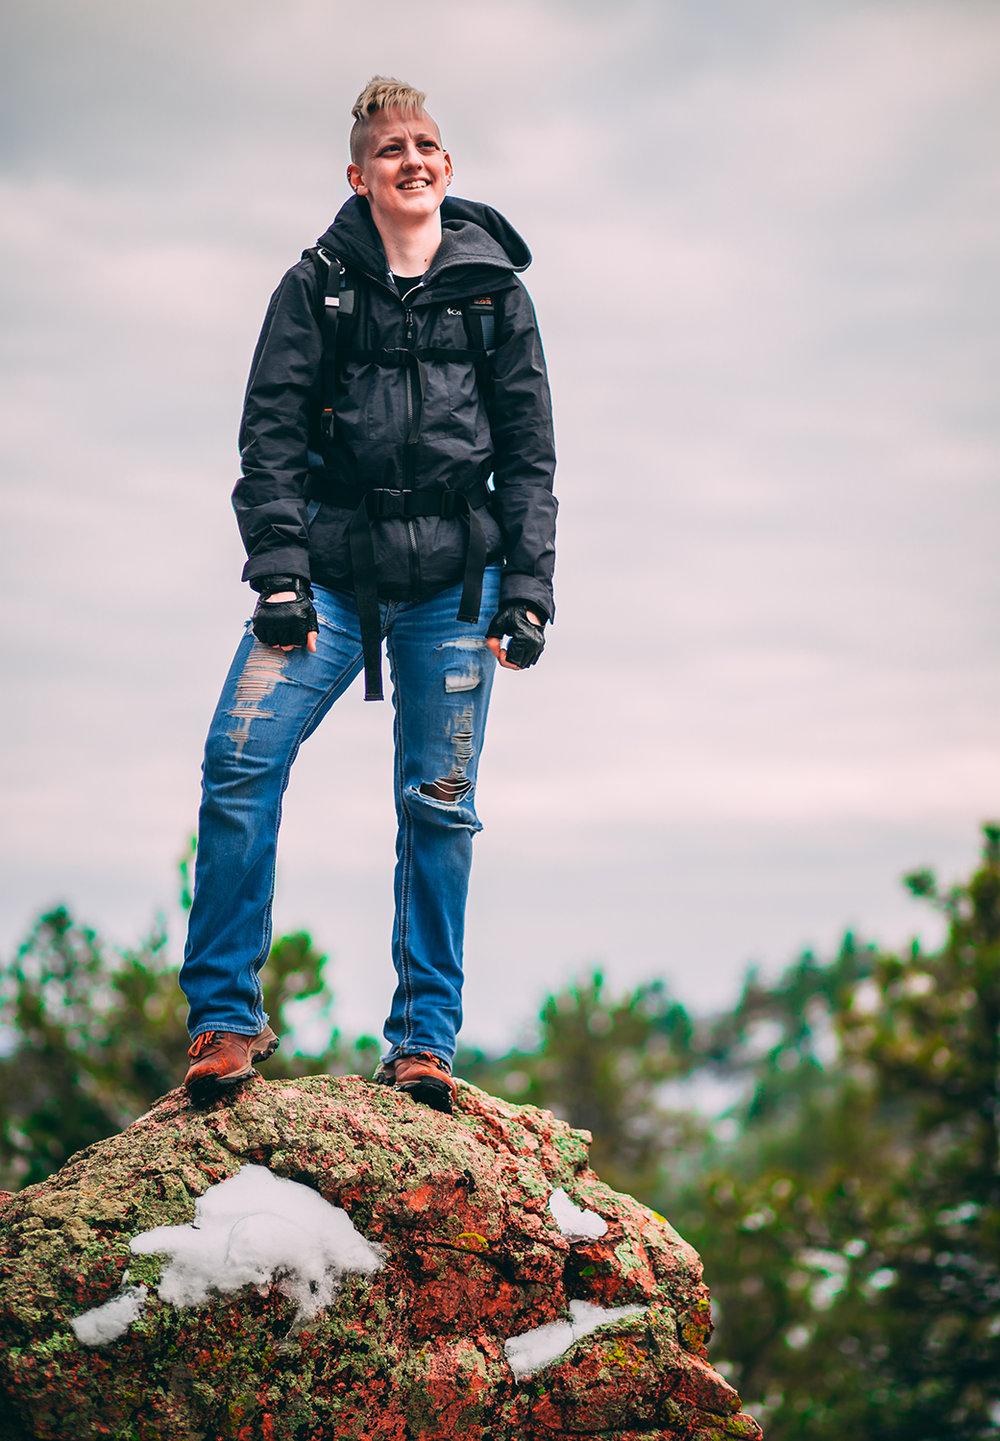 Colorado Photographer - Justice Simpson Portrait